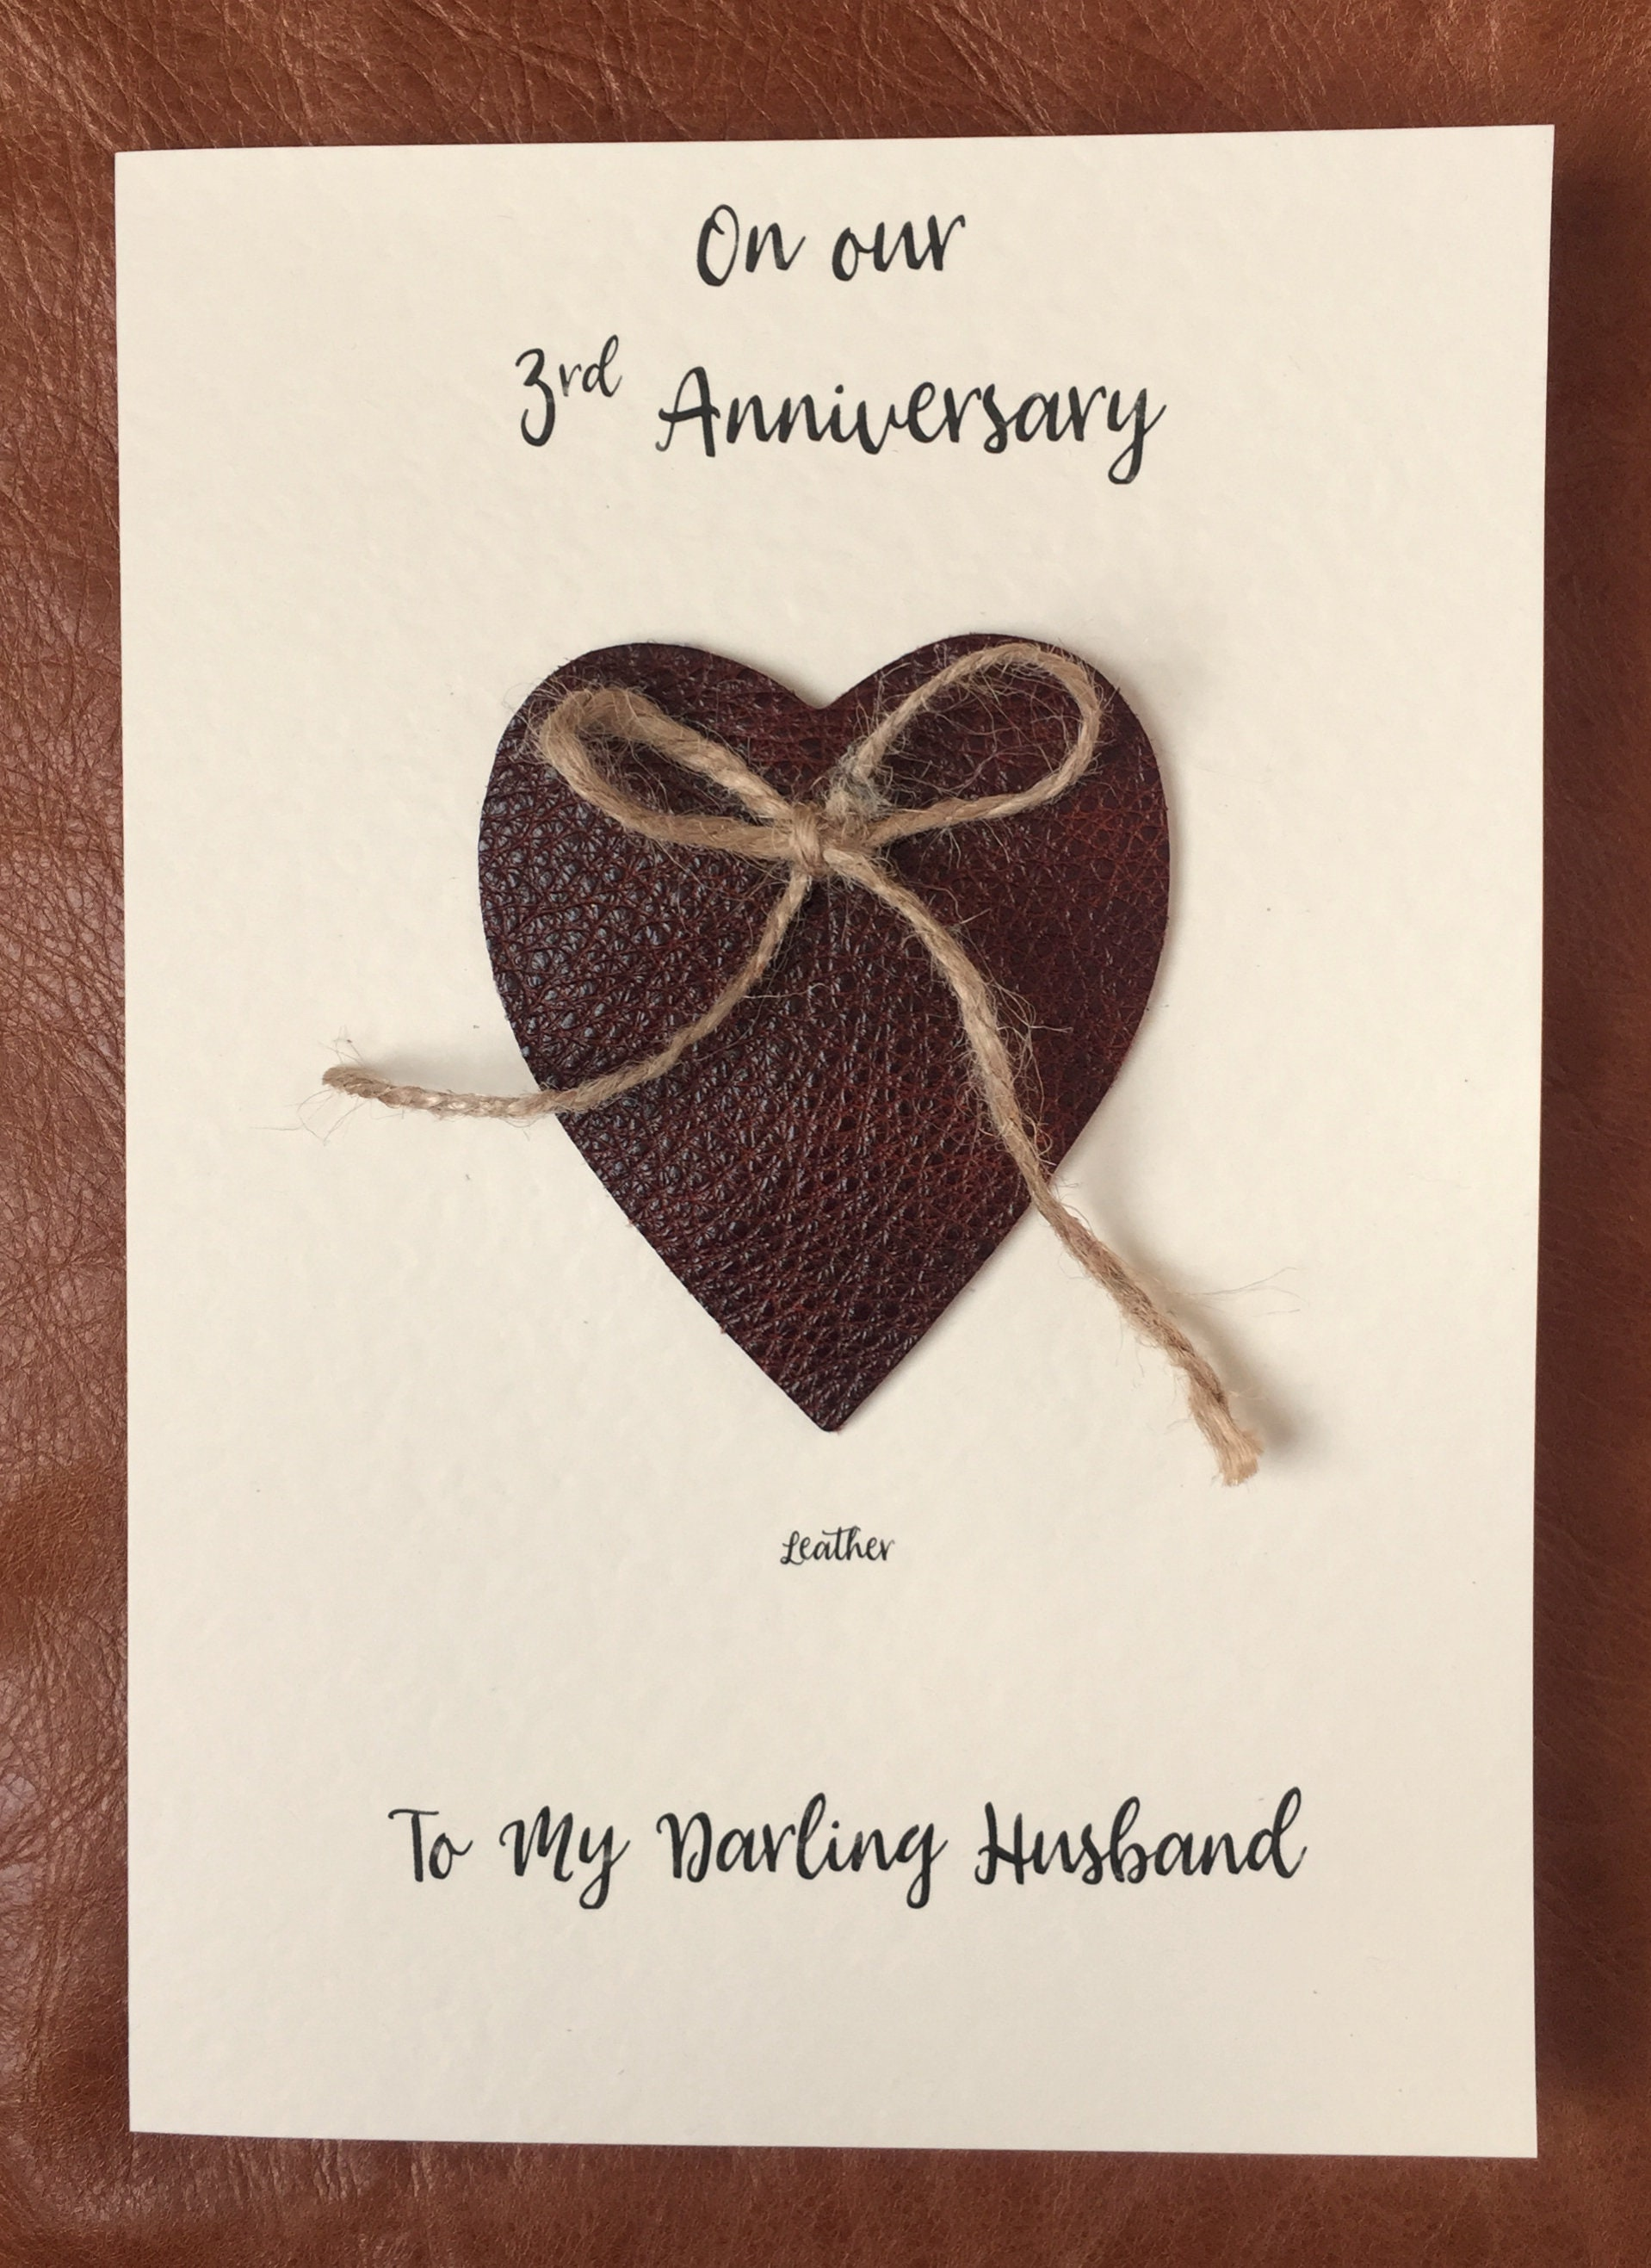 3rd Wedding Anniversary Cards Handmade Leather Anniversary Heart